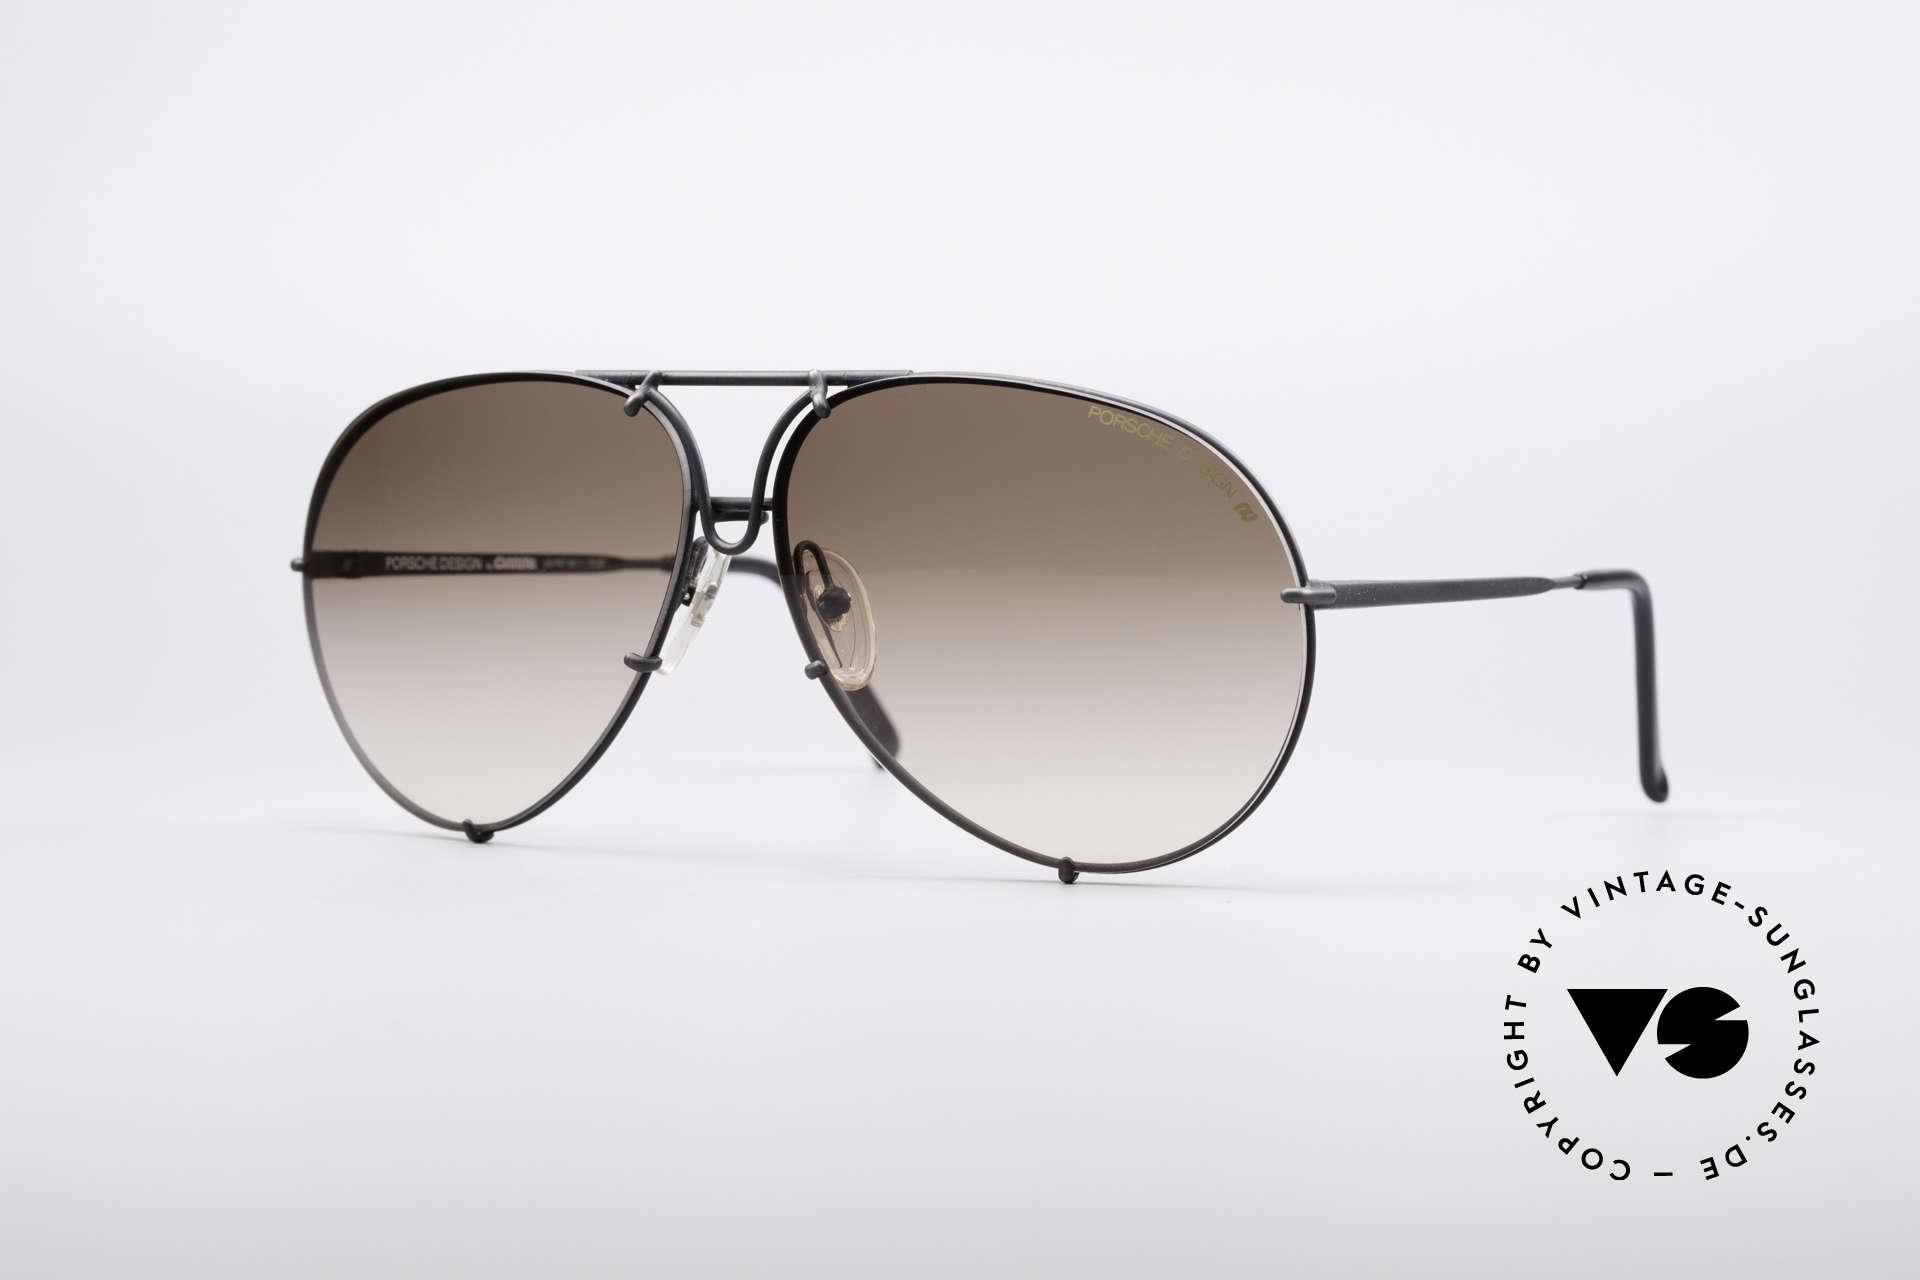 Porsche 5621A Rare 90's Aviator Shades, 90's vintage PORSCHE Design by Carrera sunglasses, Made for Men